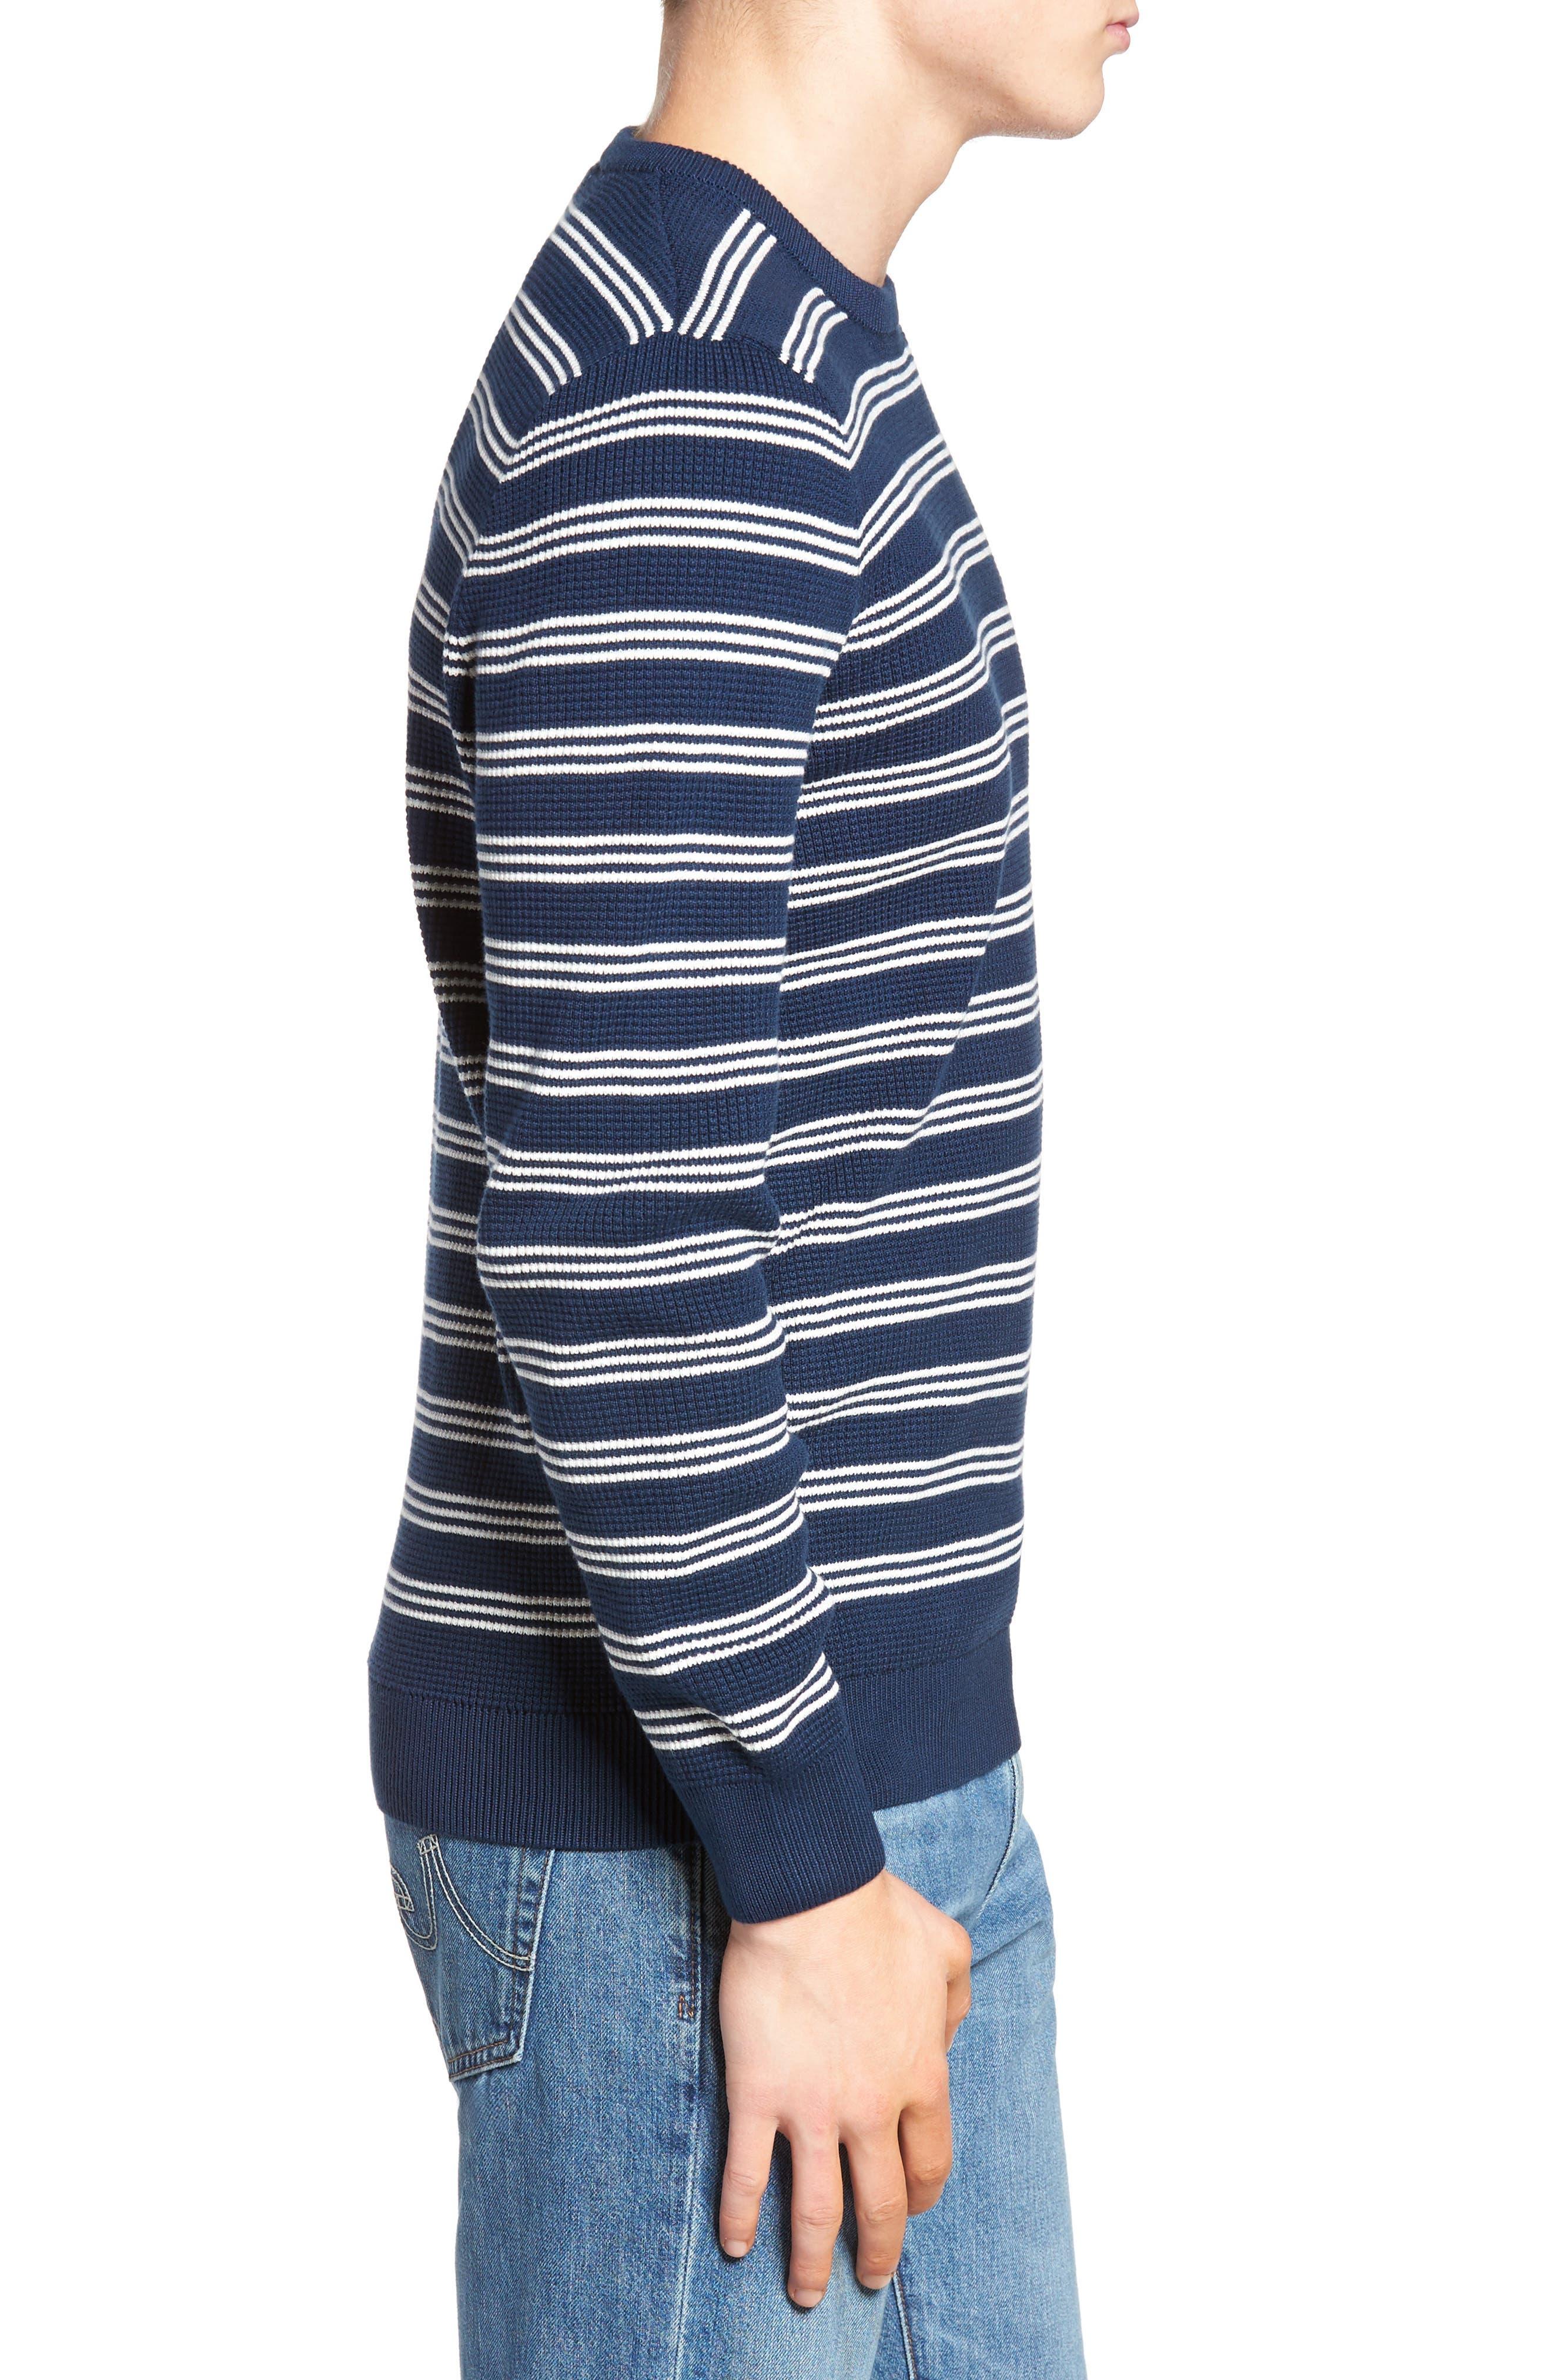 Alternate Image 3  - Lacoste Waffle Stitch Stripe Sweater